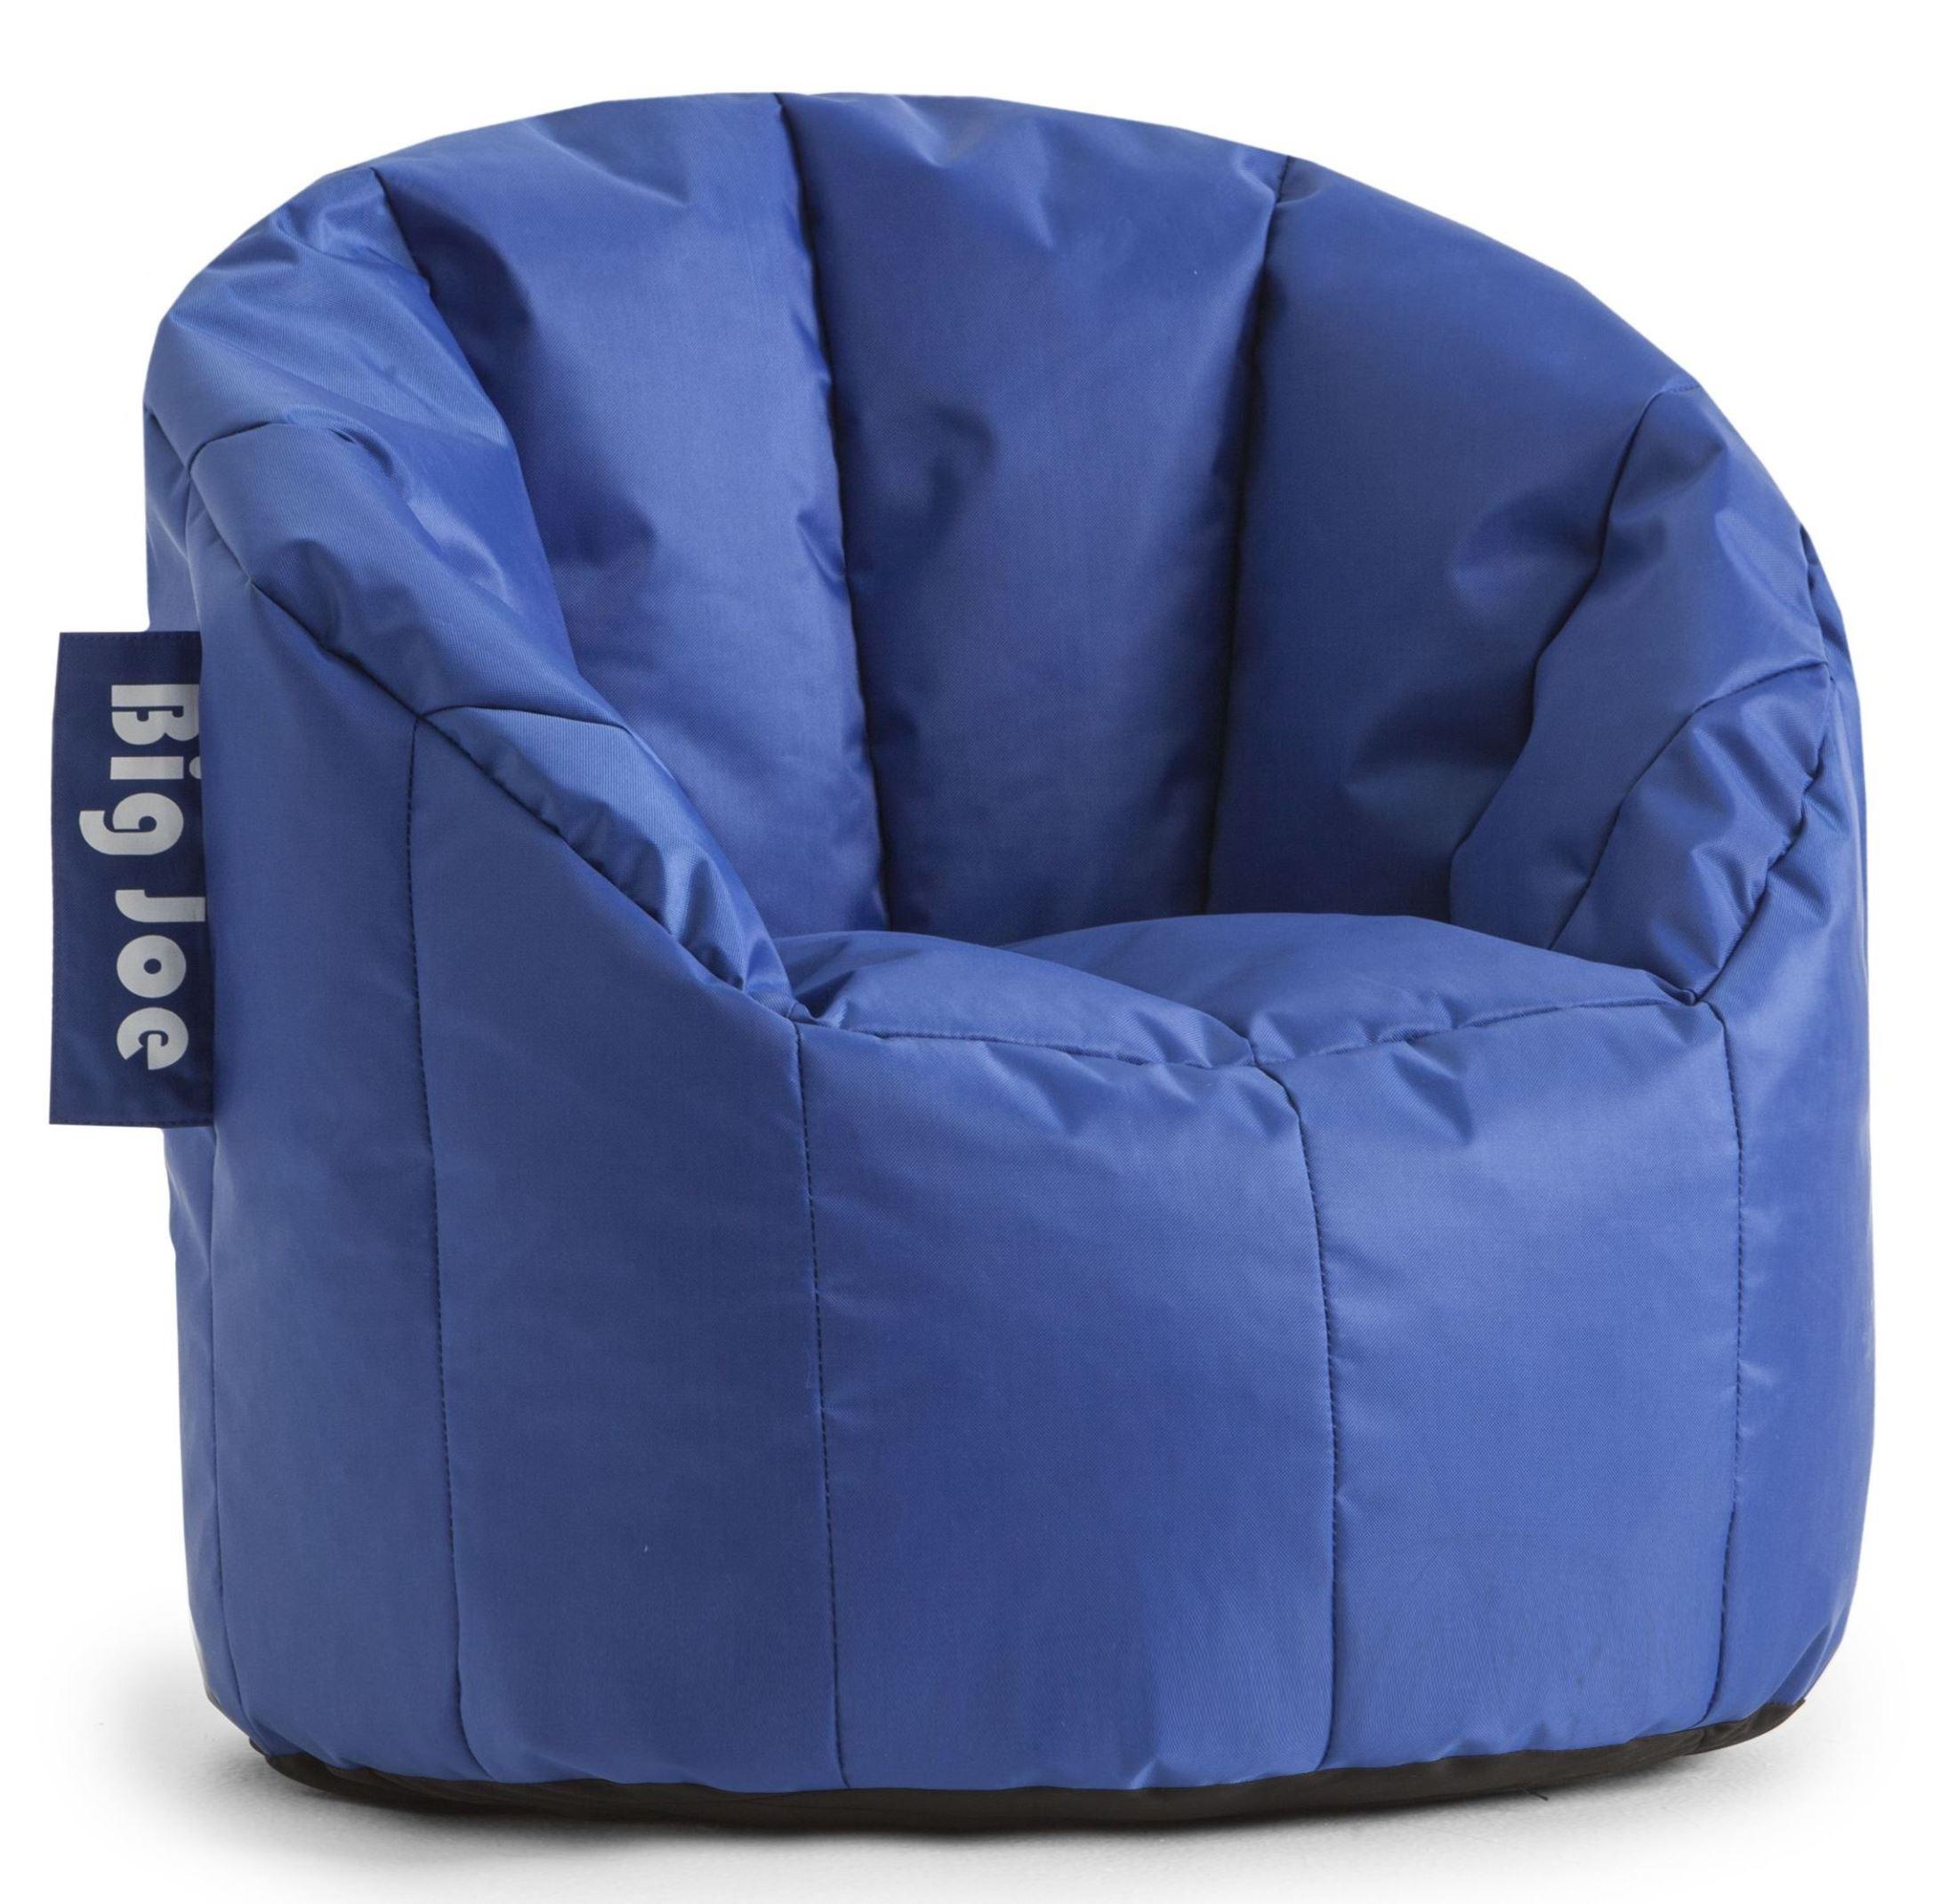 Big joe lumin chair blue - Big Joe Kids Lumin Sapphire Smartmax Chair From Comfort Research